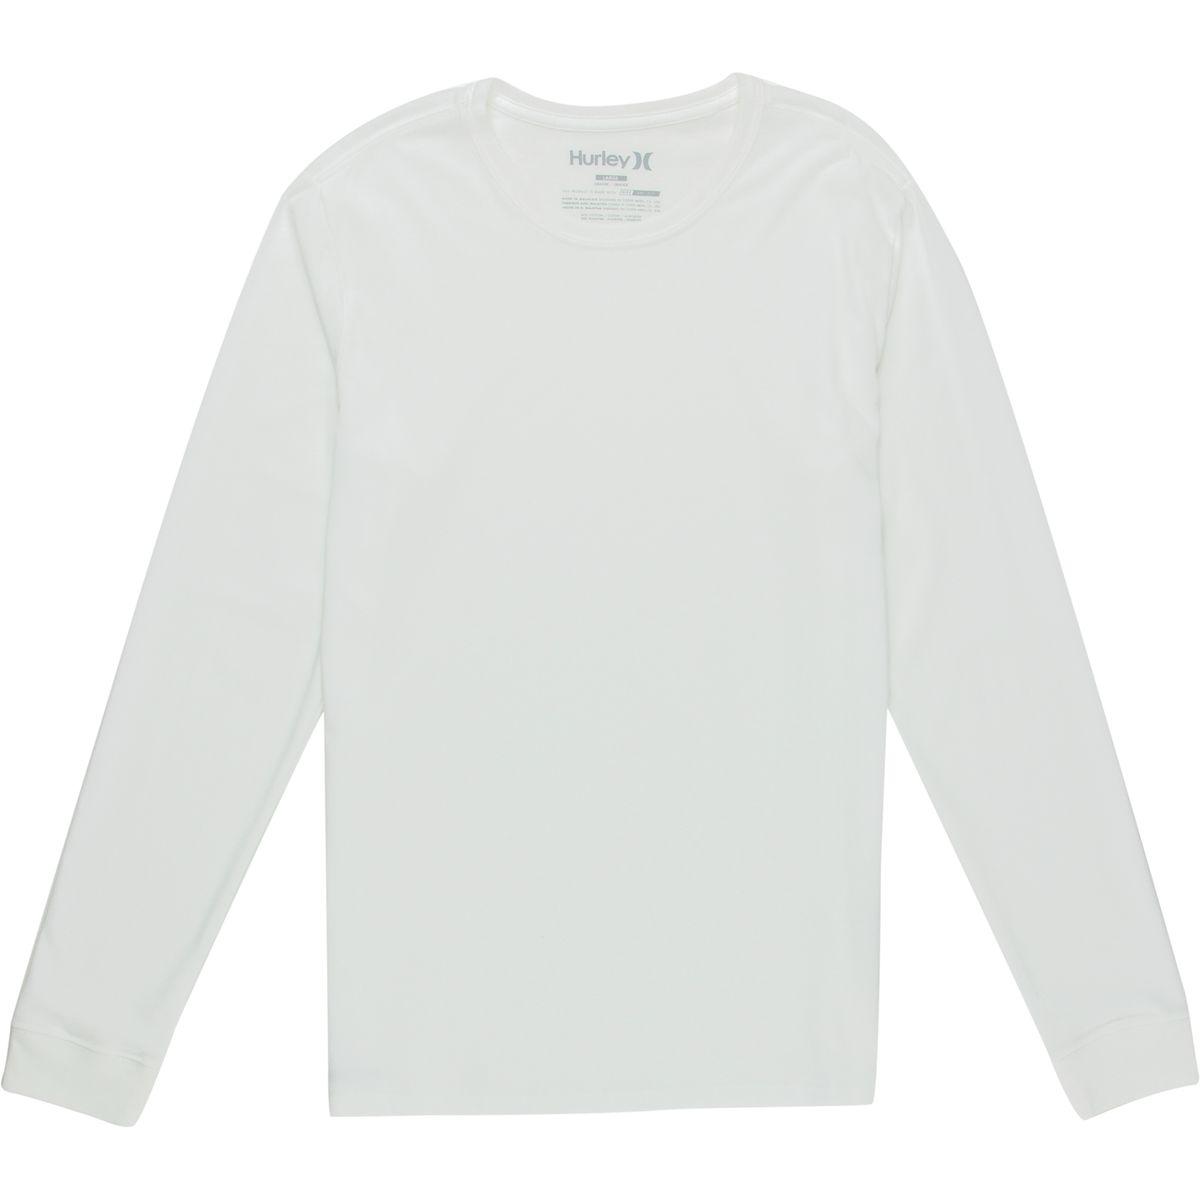 Hurley Staple Dri-Fit Premium T-Shirt - Long-Sleeve - Men